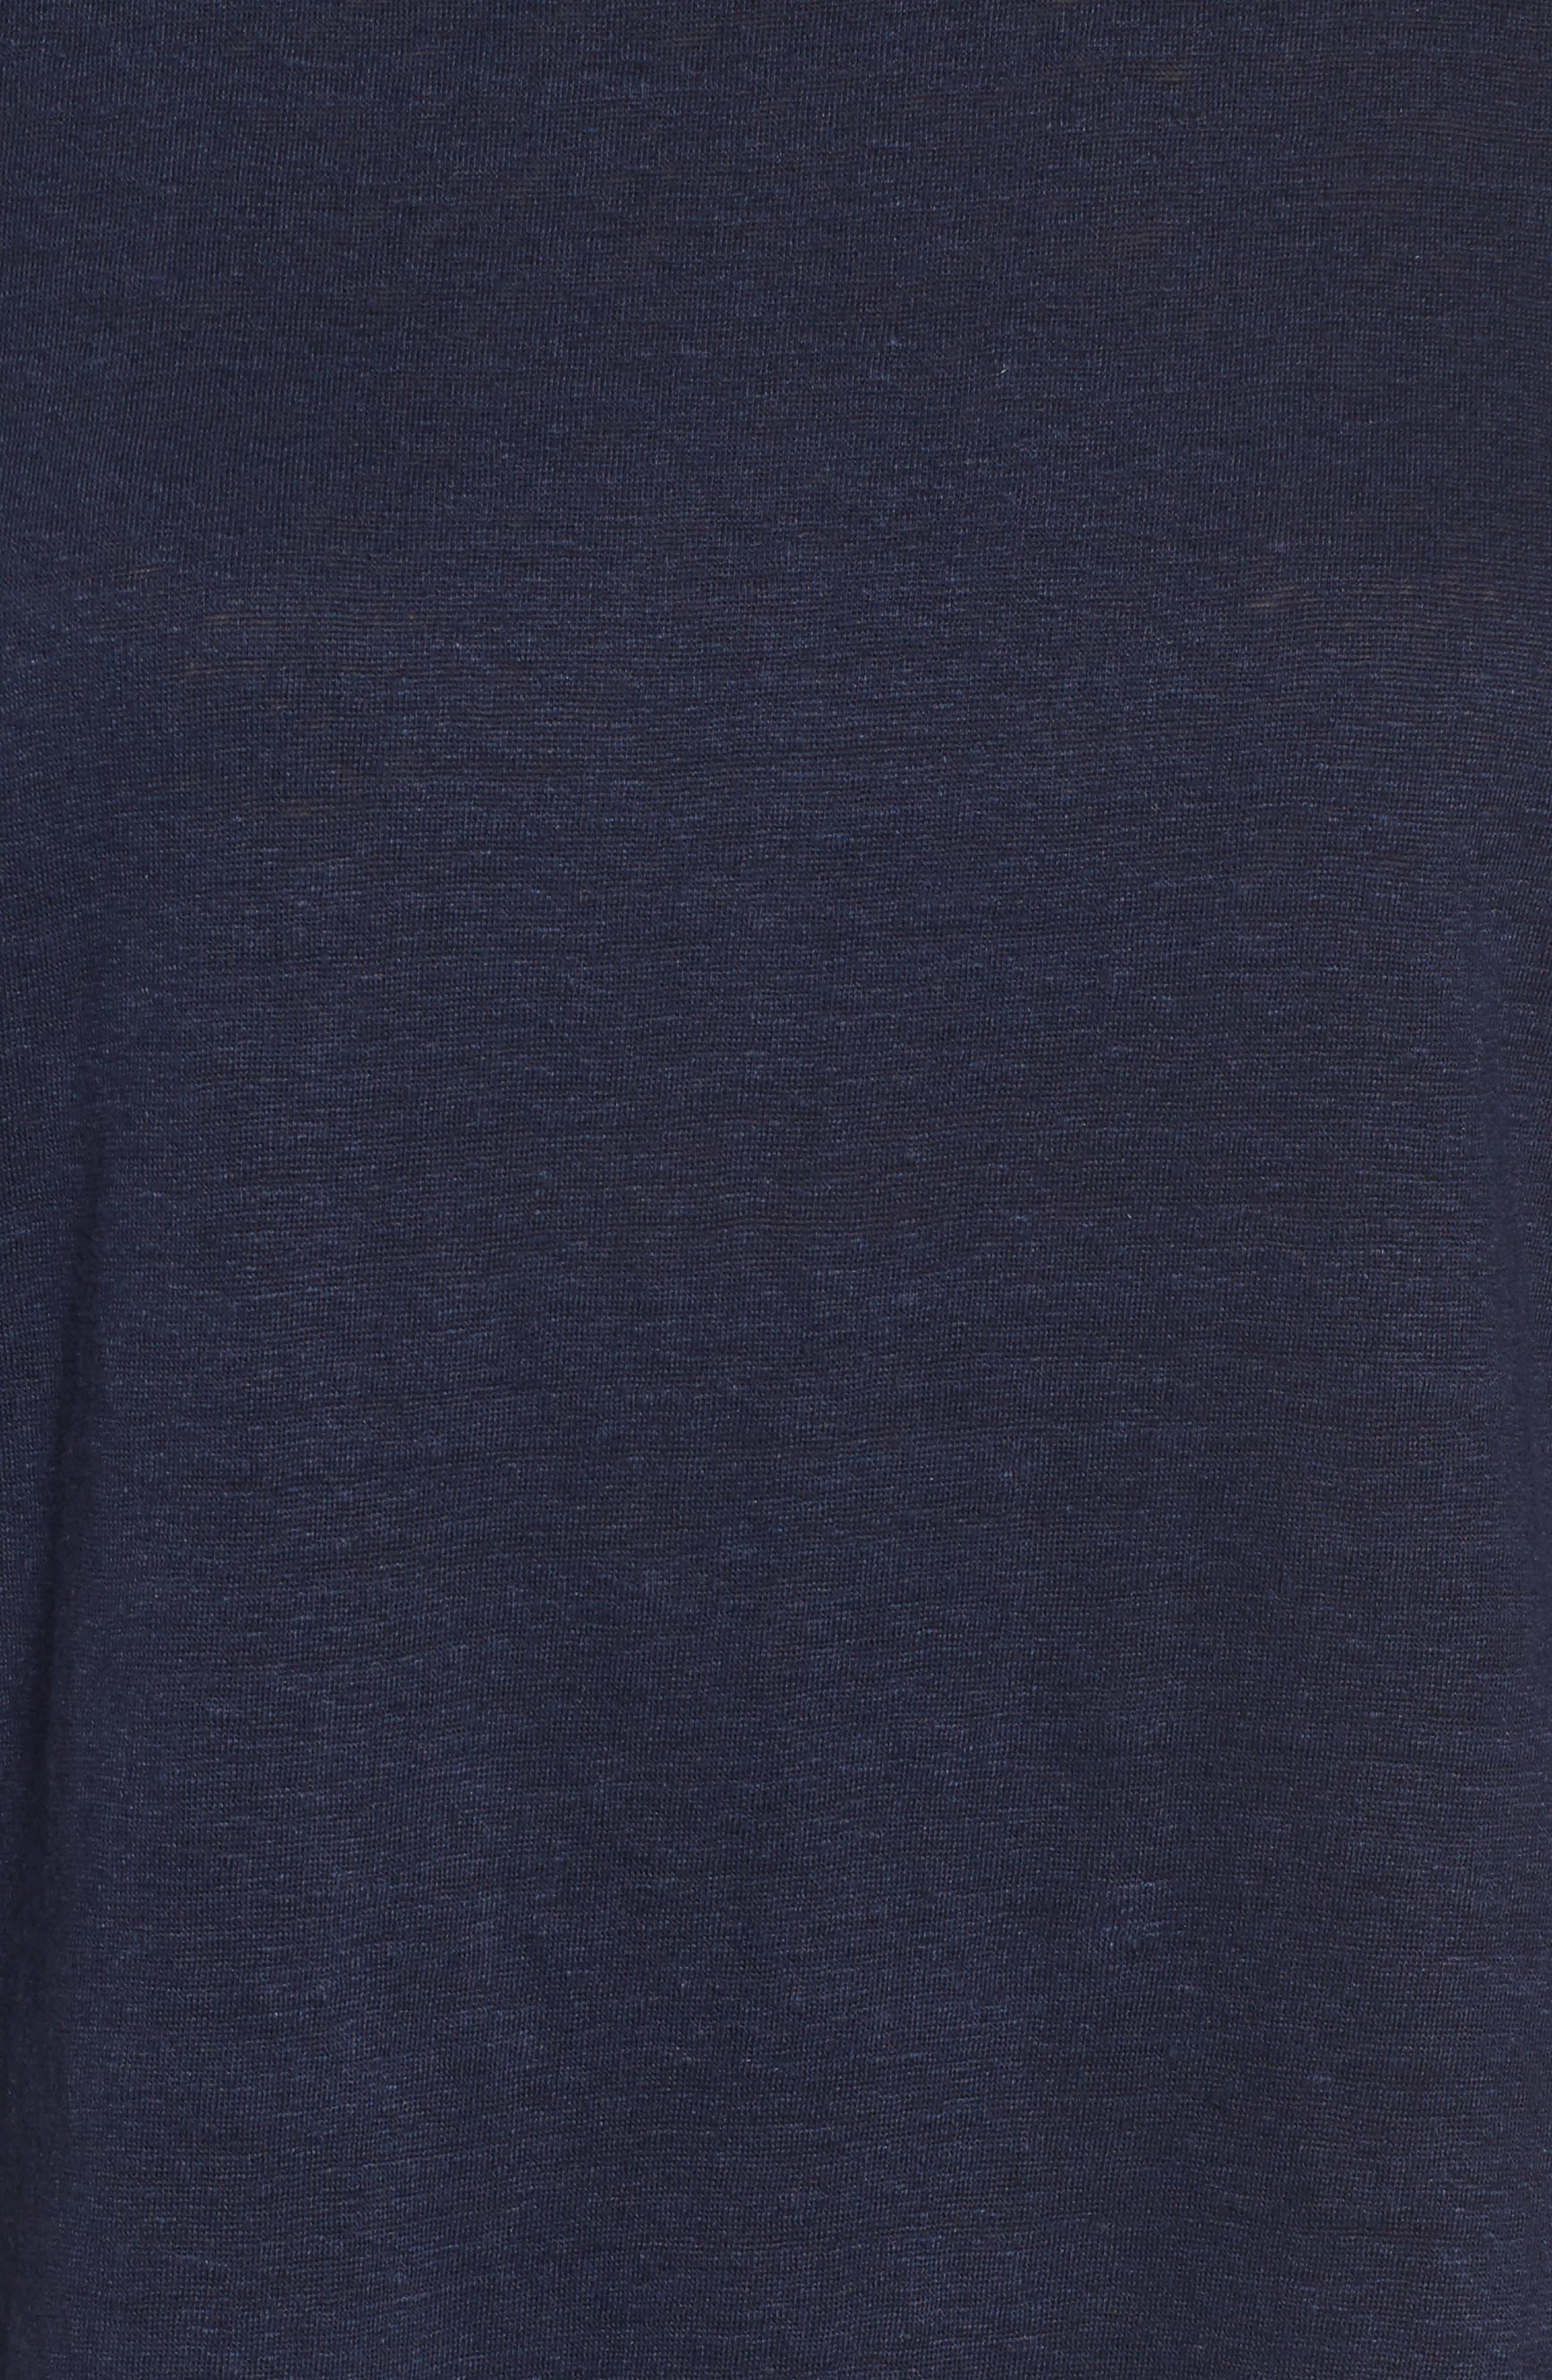 Slouchy Organic Linen Top,                             Alternate thumbnail 30, color,